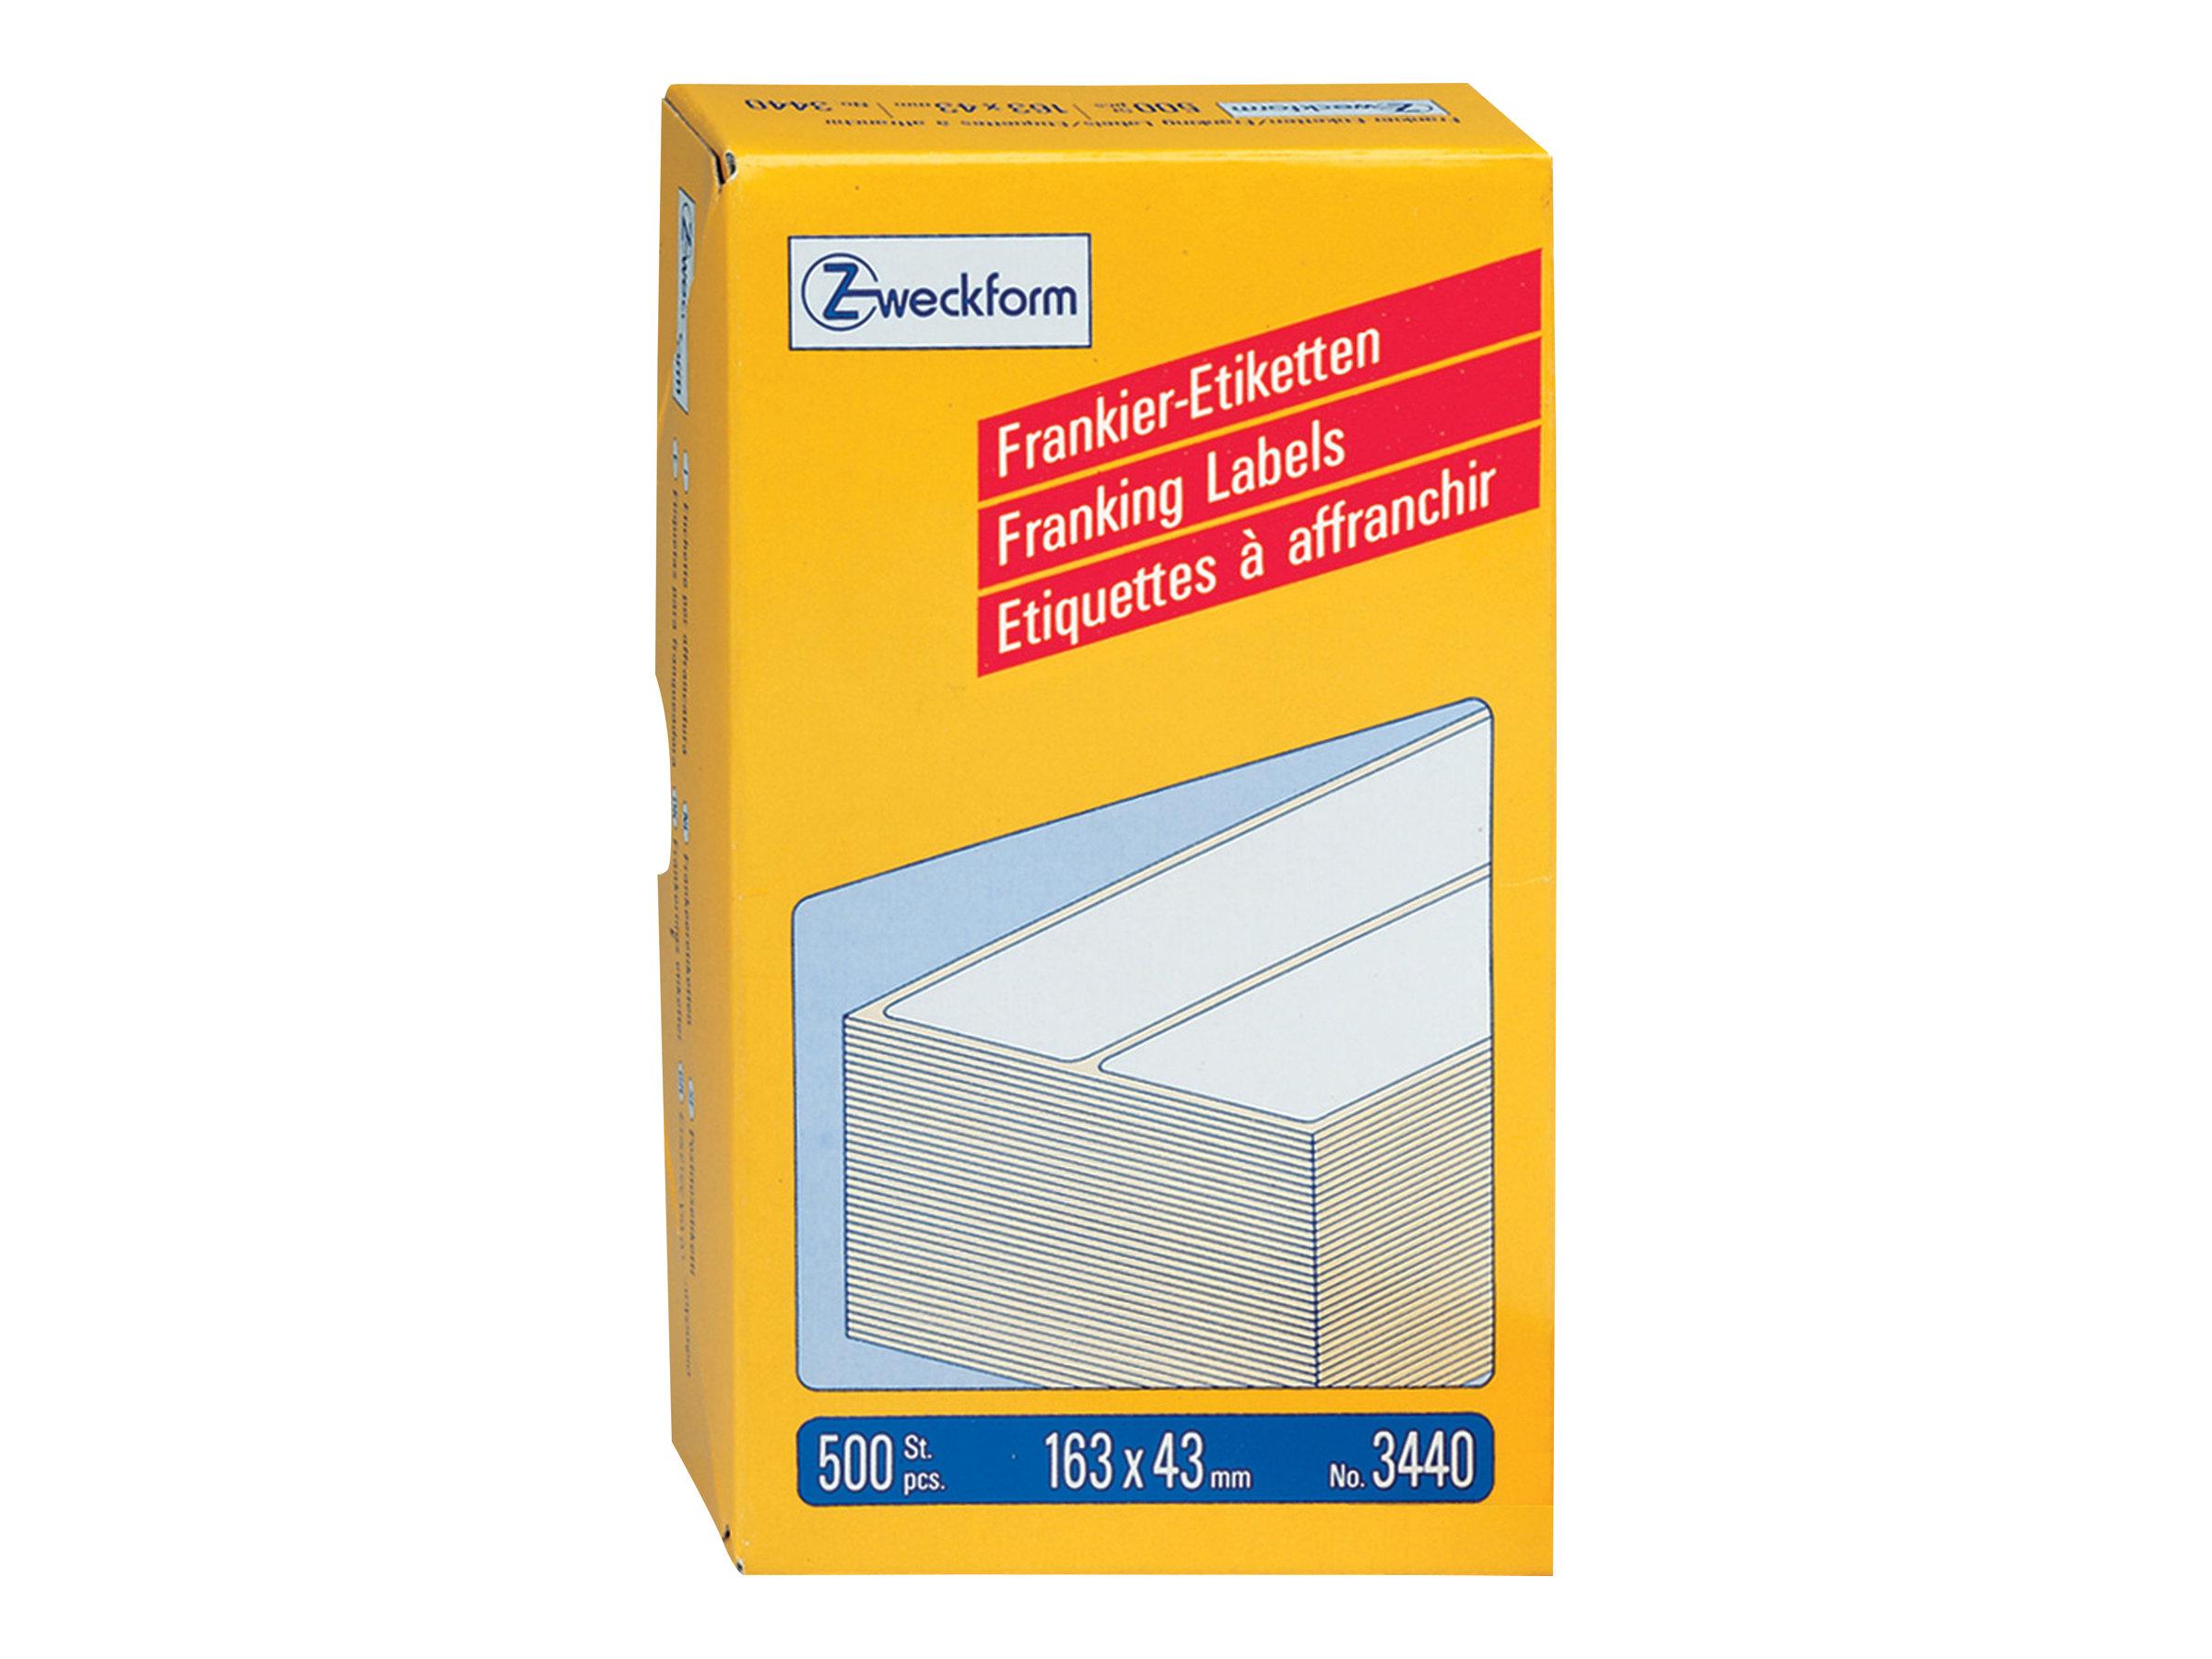 Avery Zweckform Permanenter Klebstoff - weiß - 163 x 43 mm 500 Etikett(en) (250 Bogen x 2)